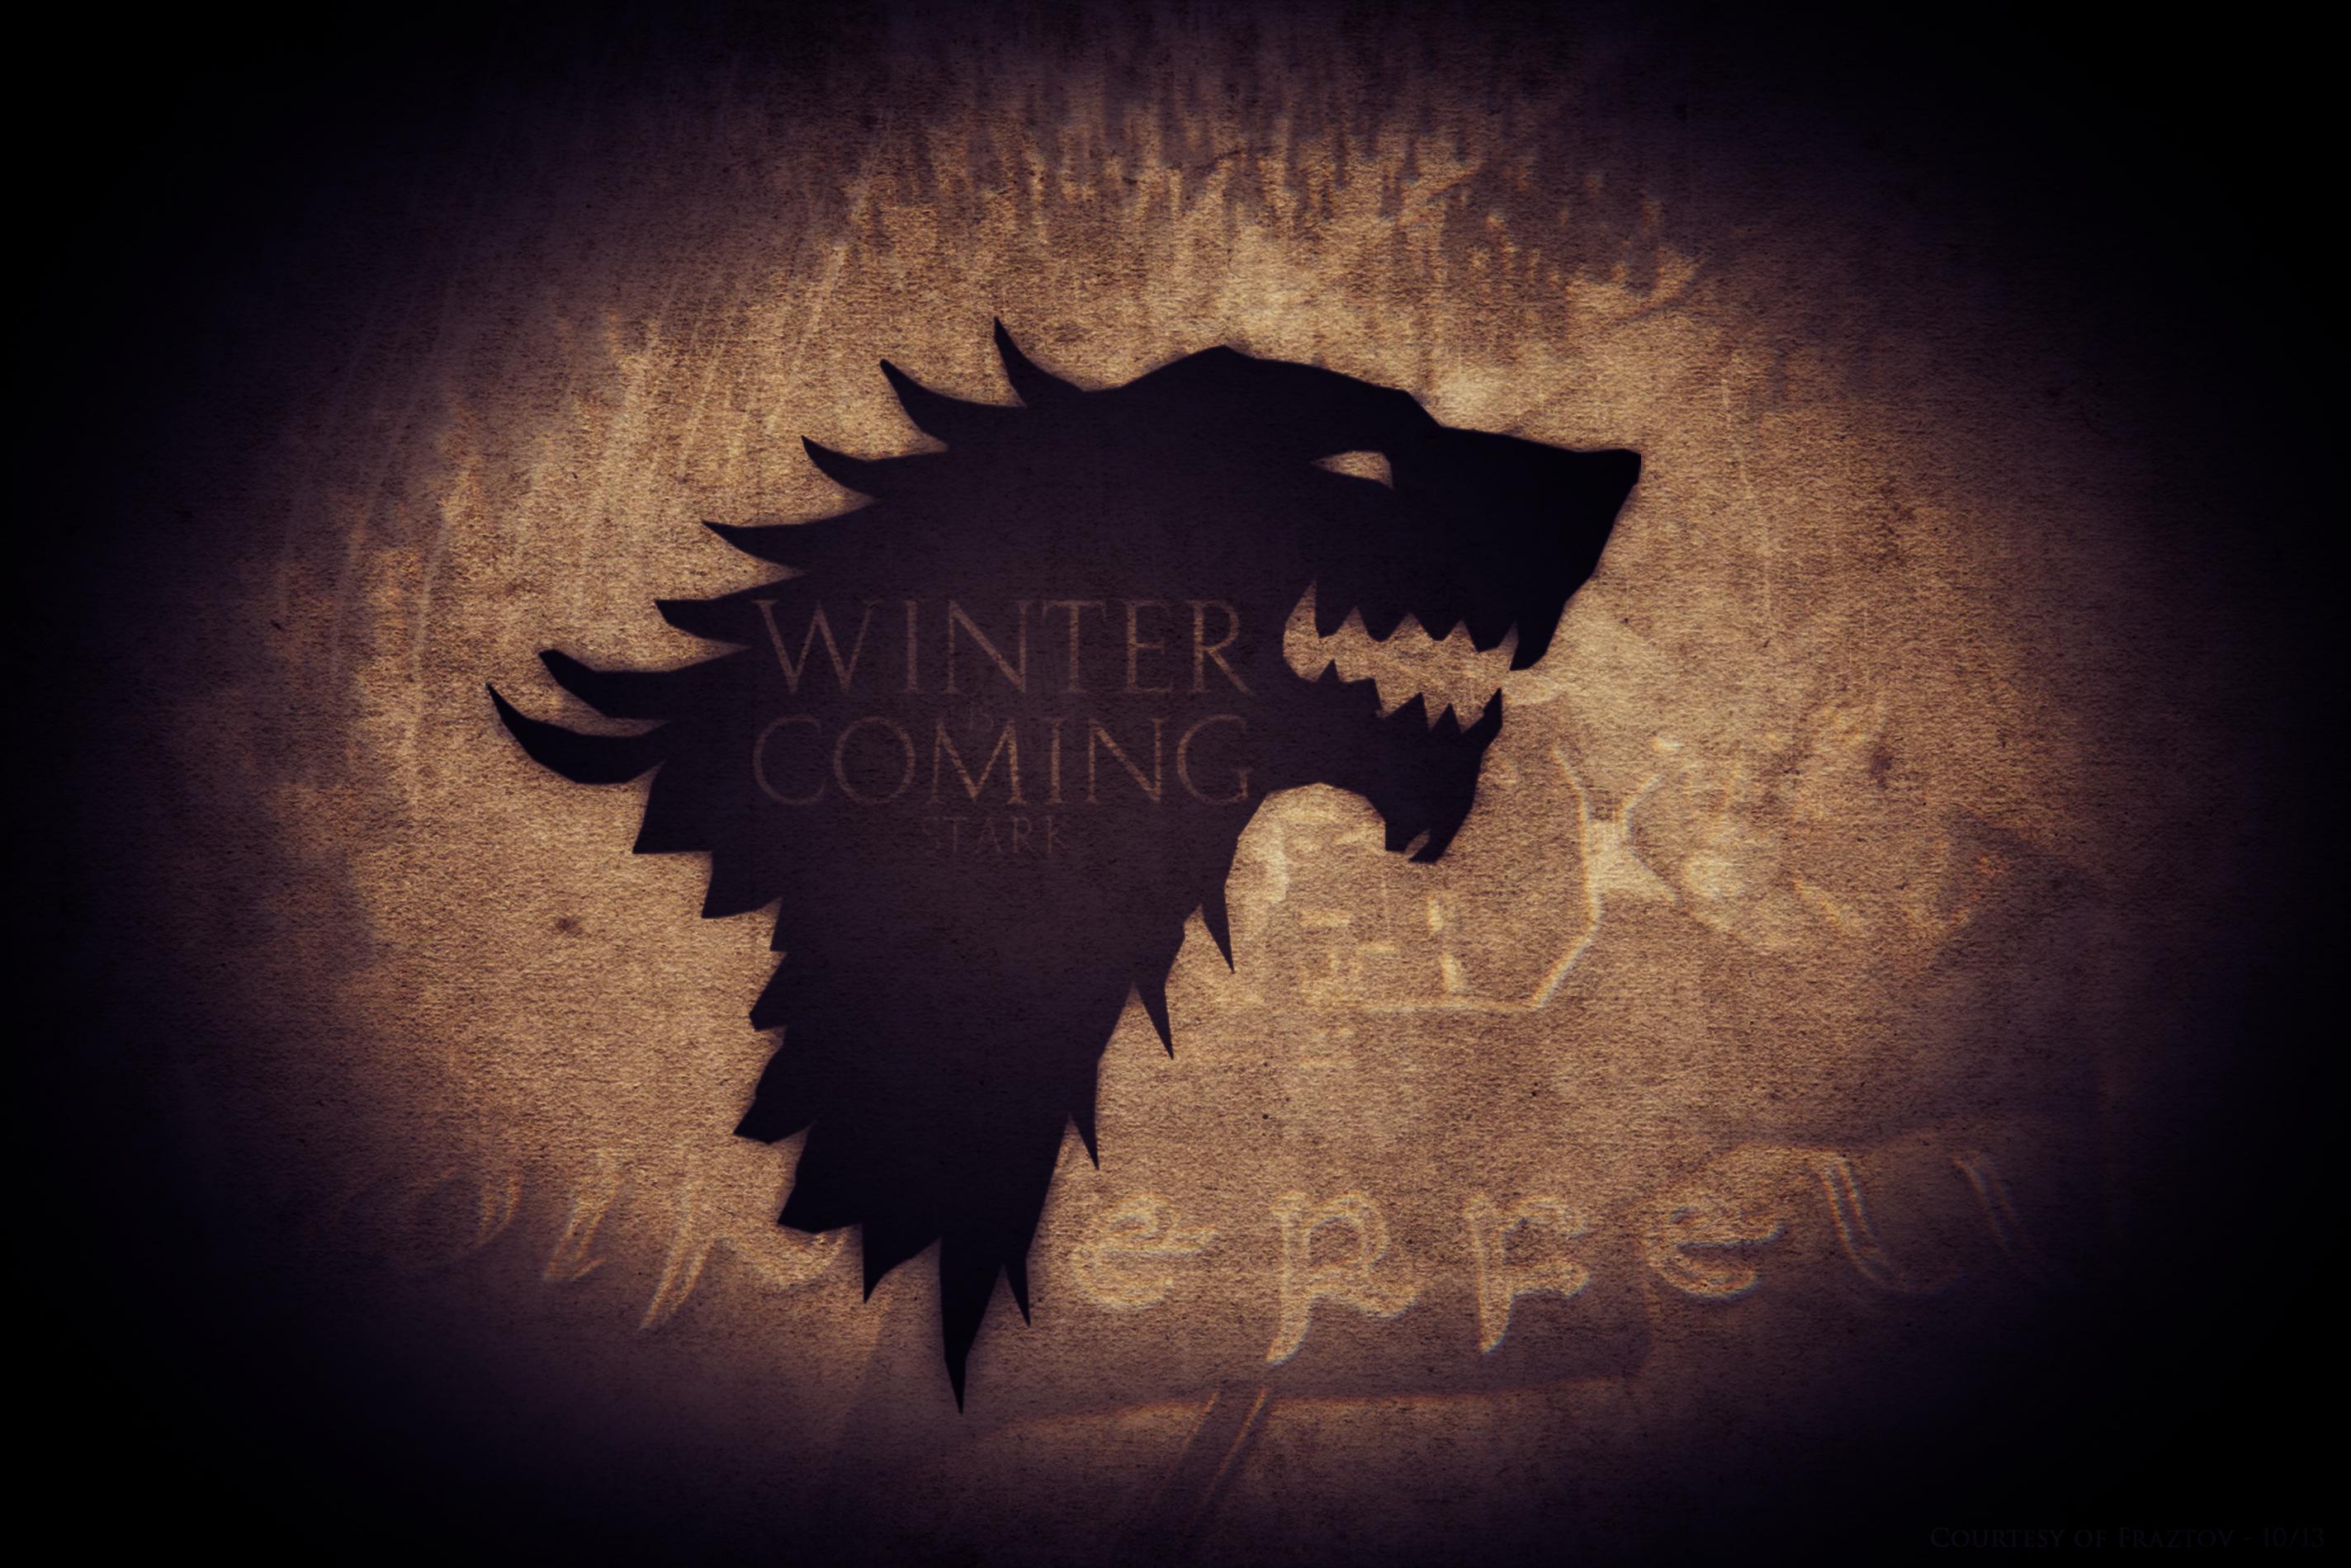 Game Of Thrones Stark Wallpaper By Fraztov On Deviantart